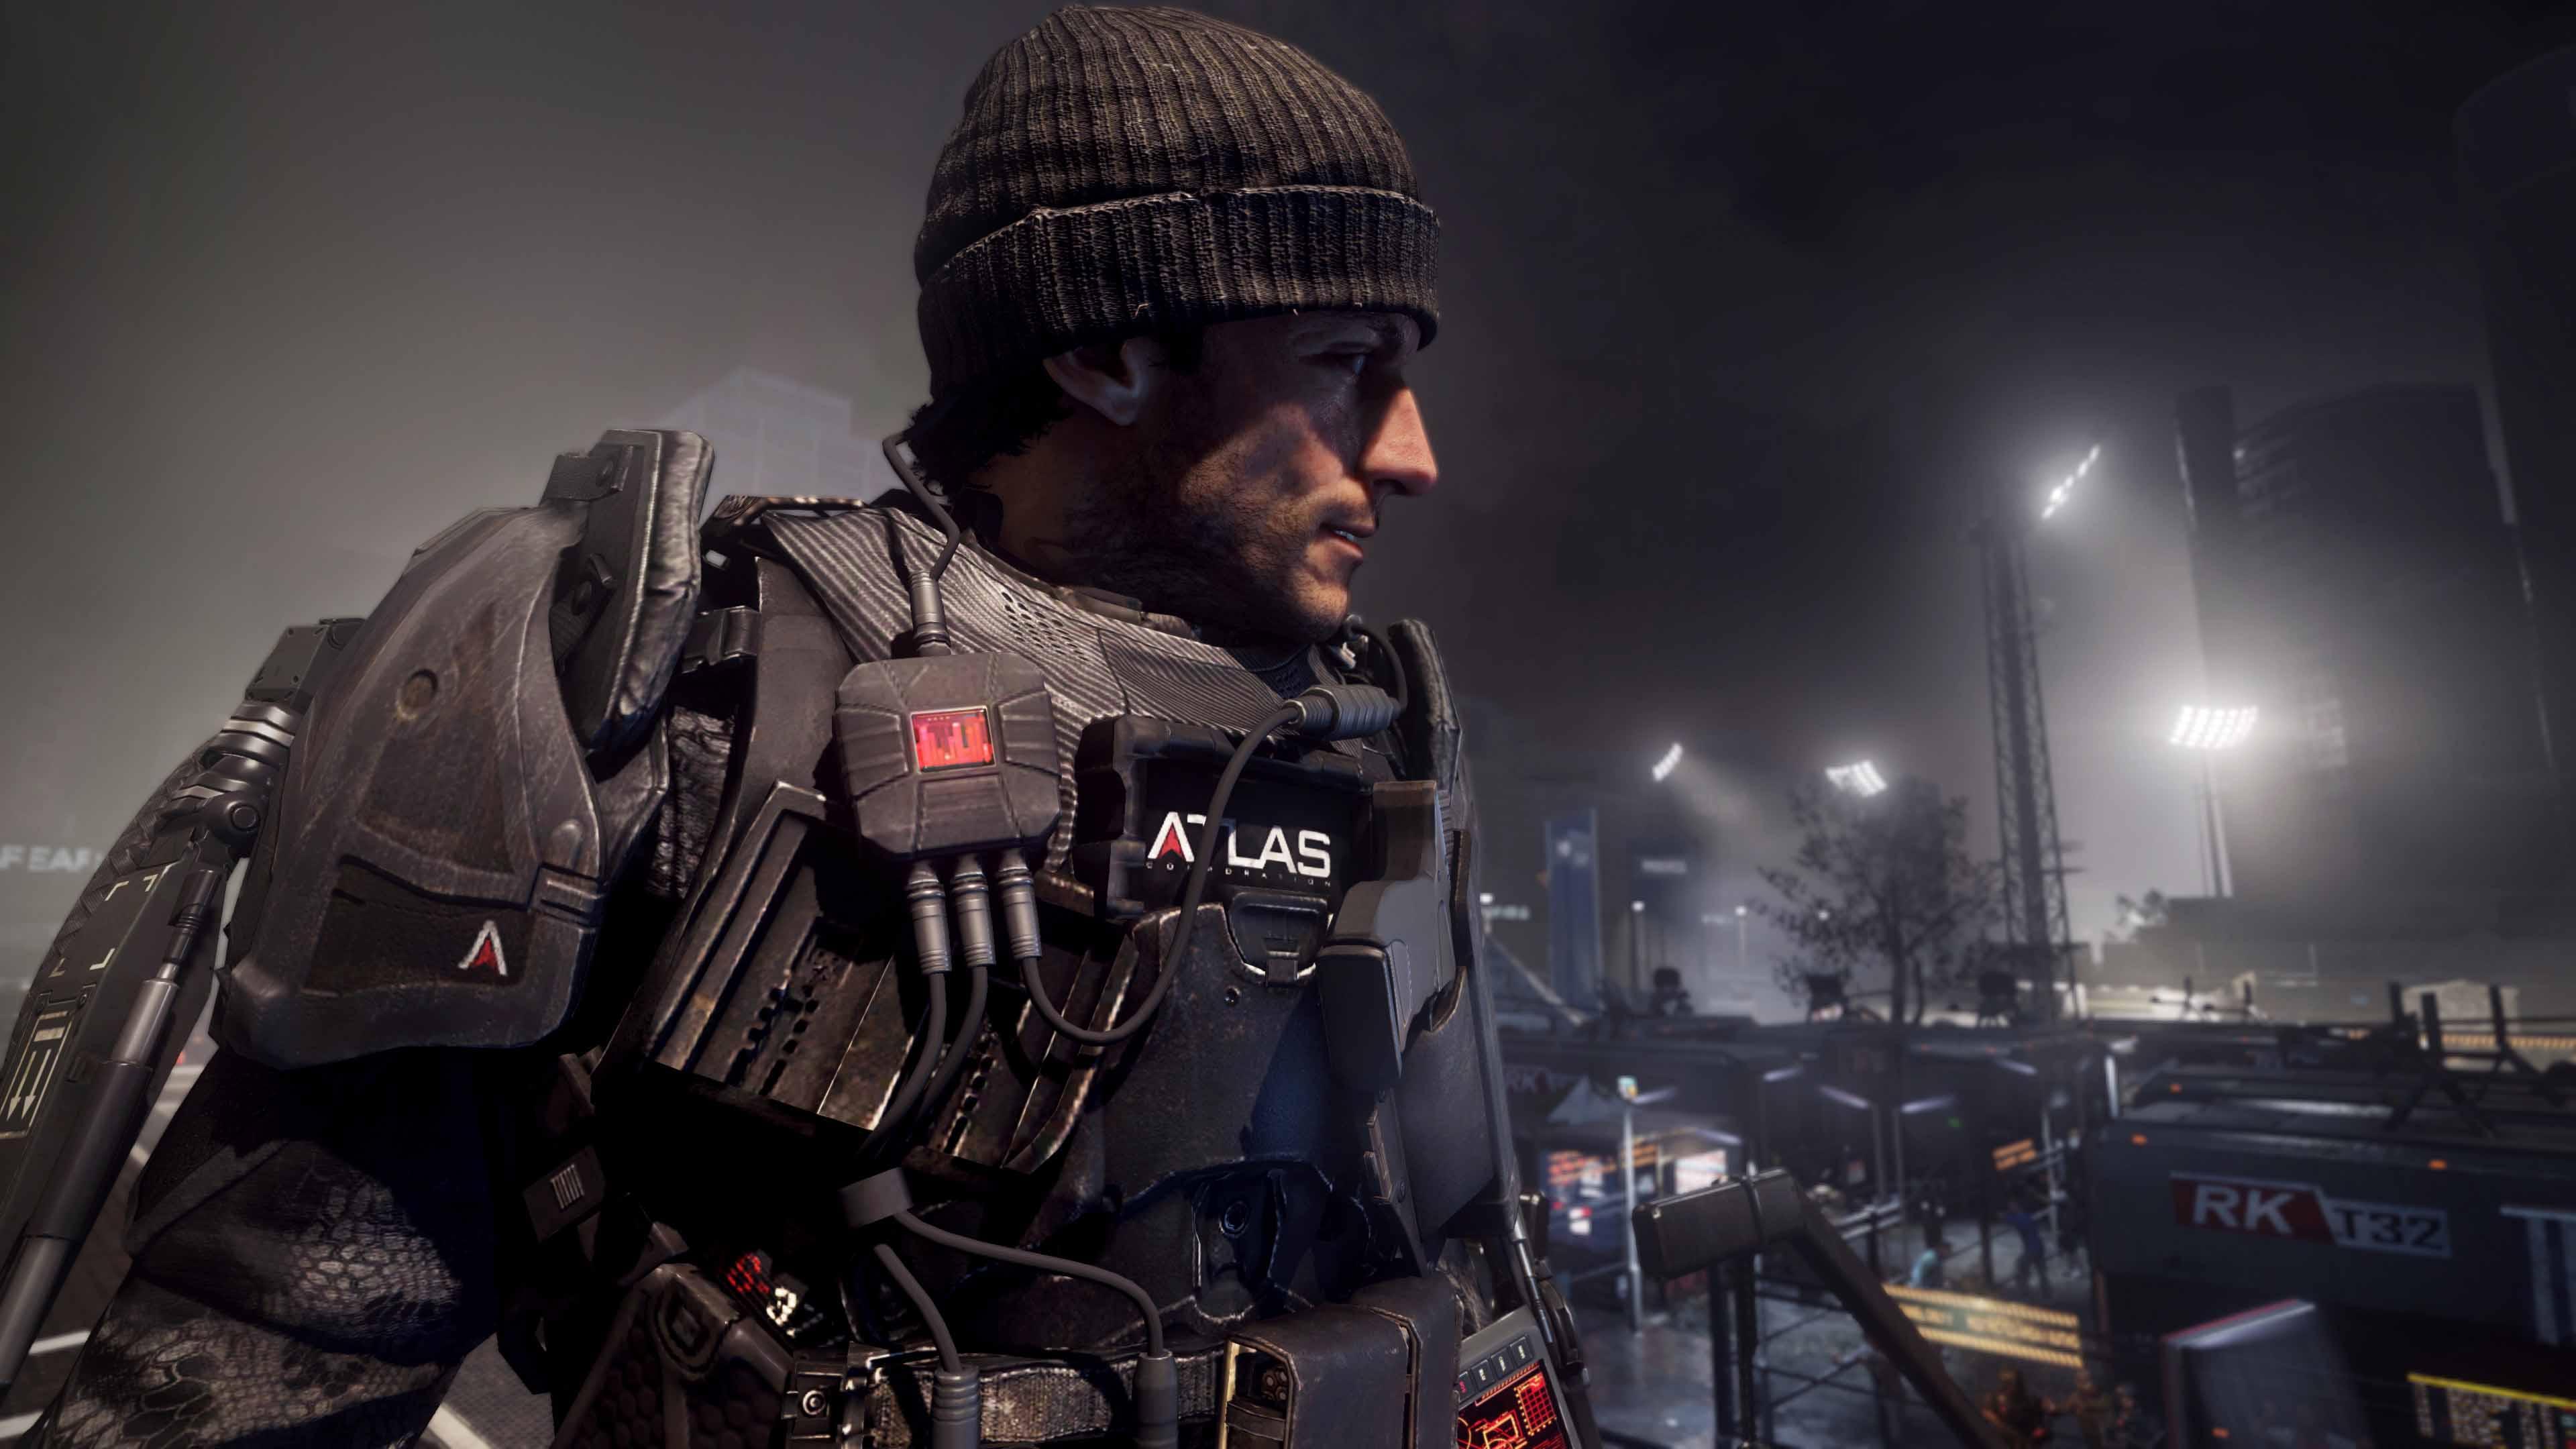 Call-of-Duty-Wallpaper-Desktop_4